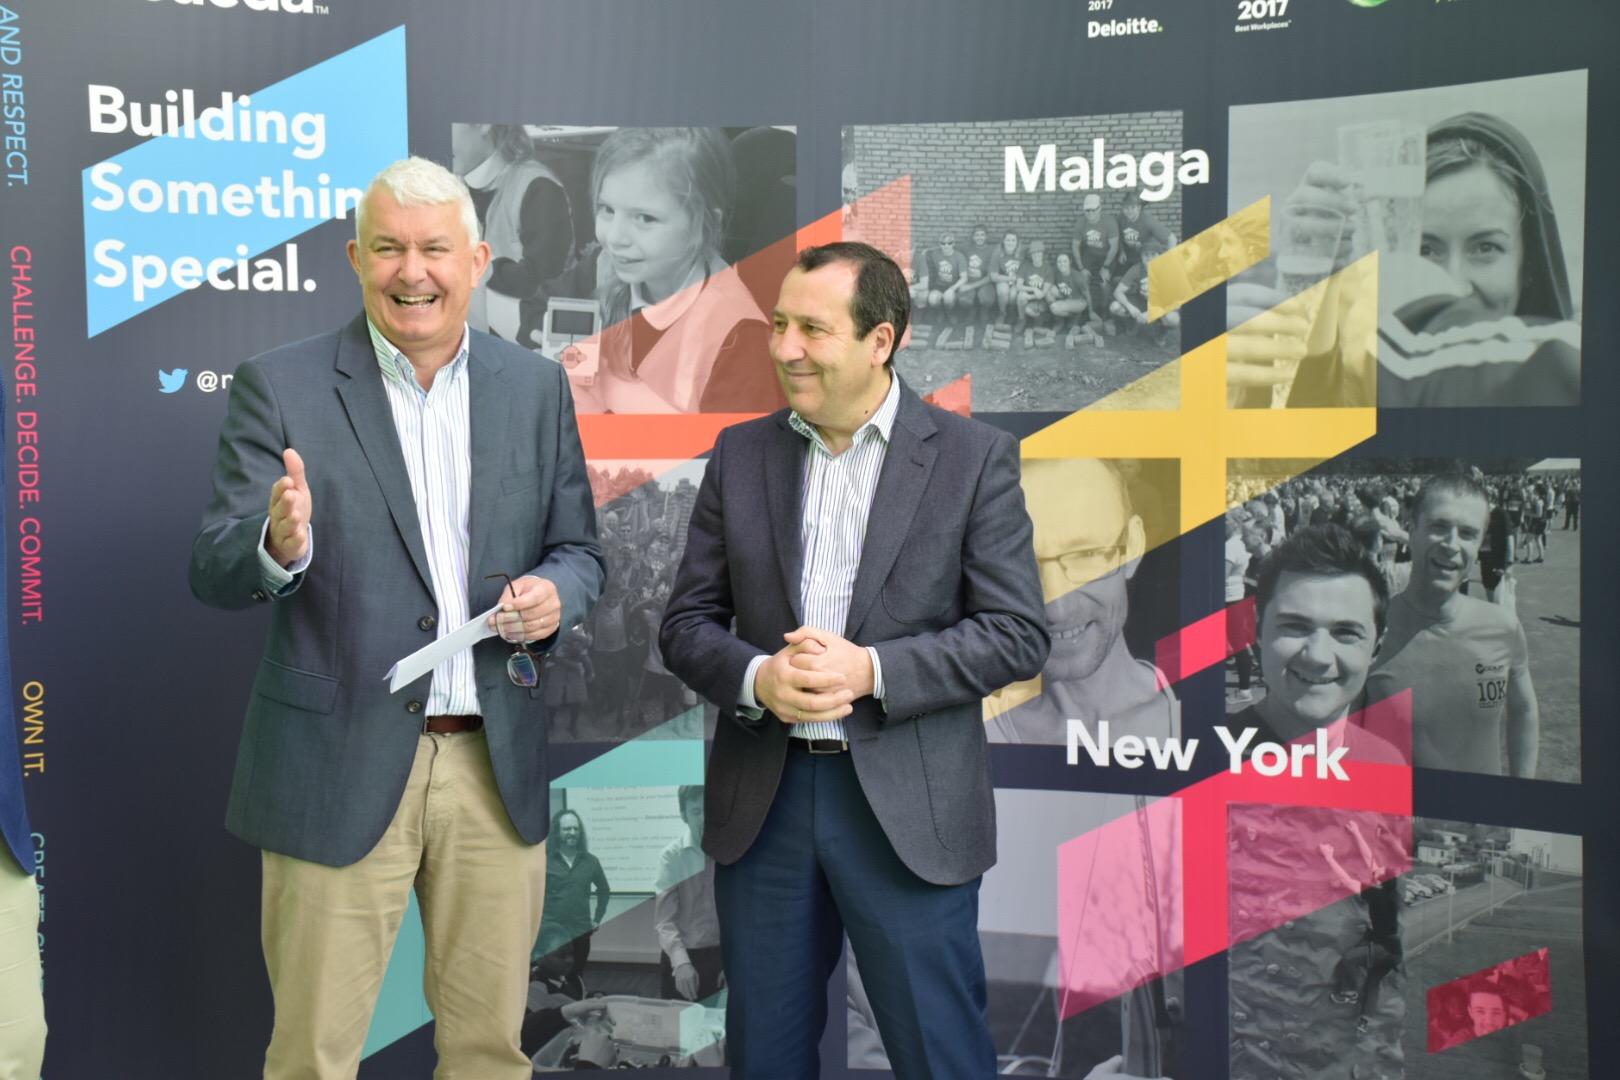 Brendan Monaghan, Neueda CEO, alongside José Luis Ruiz Espejo, president of PTA